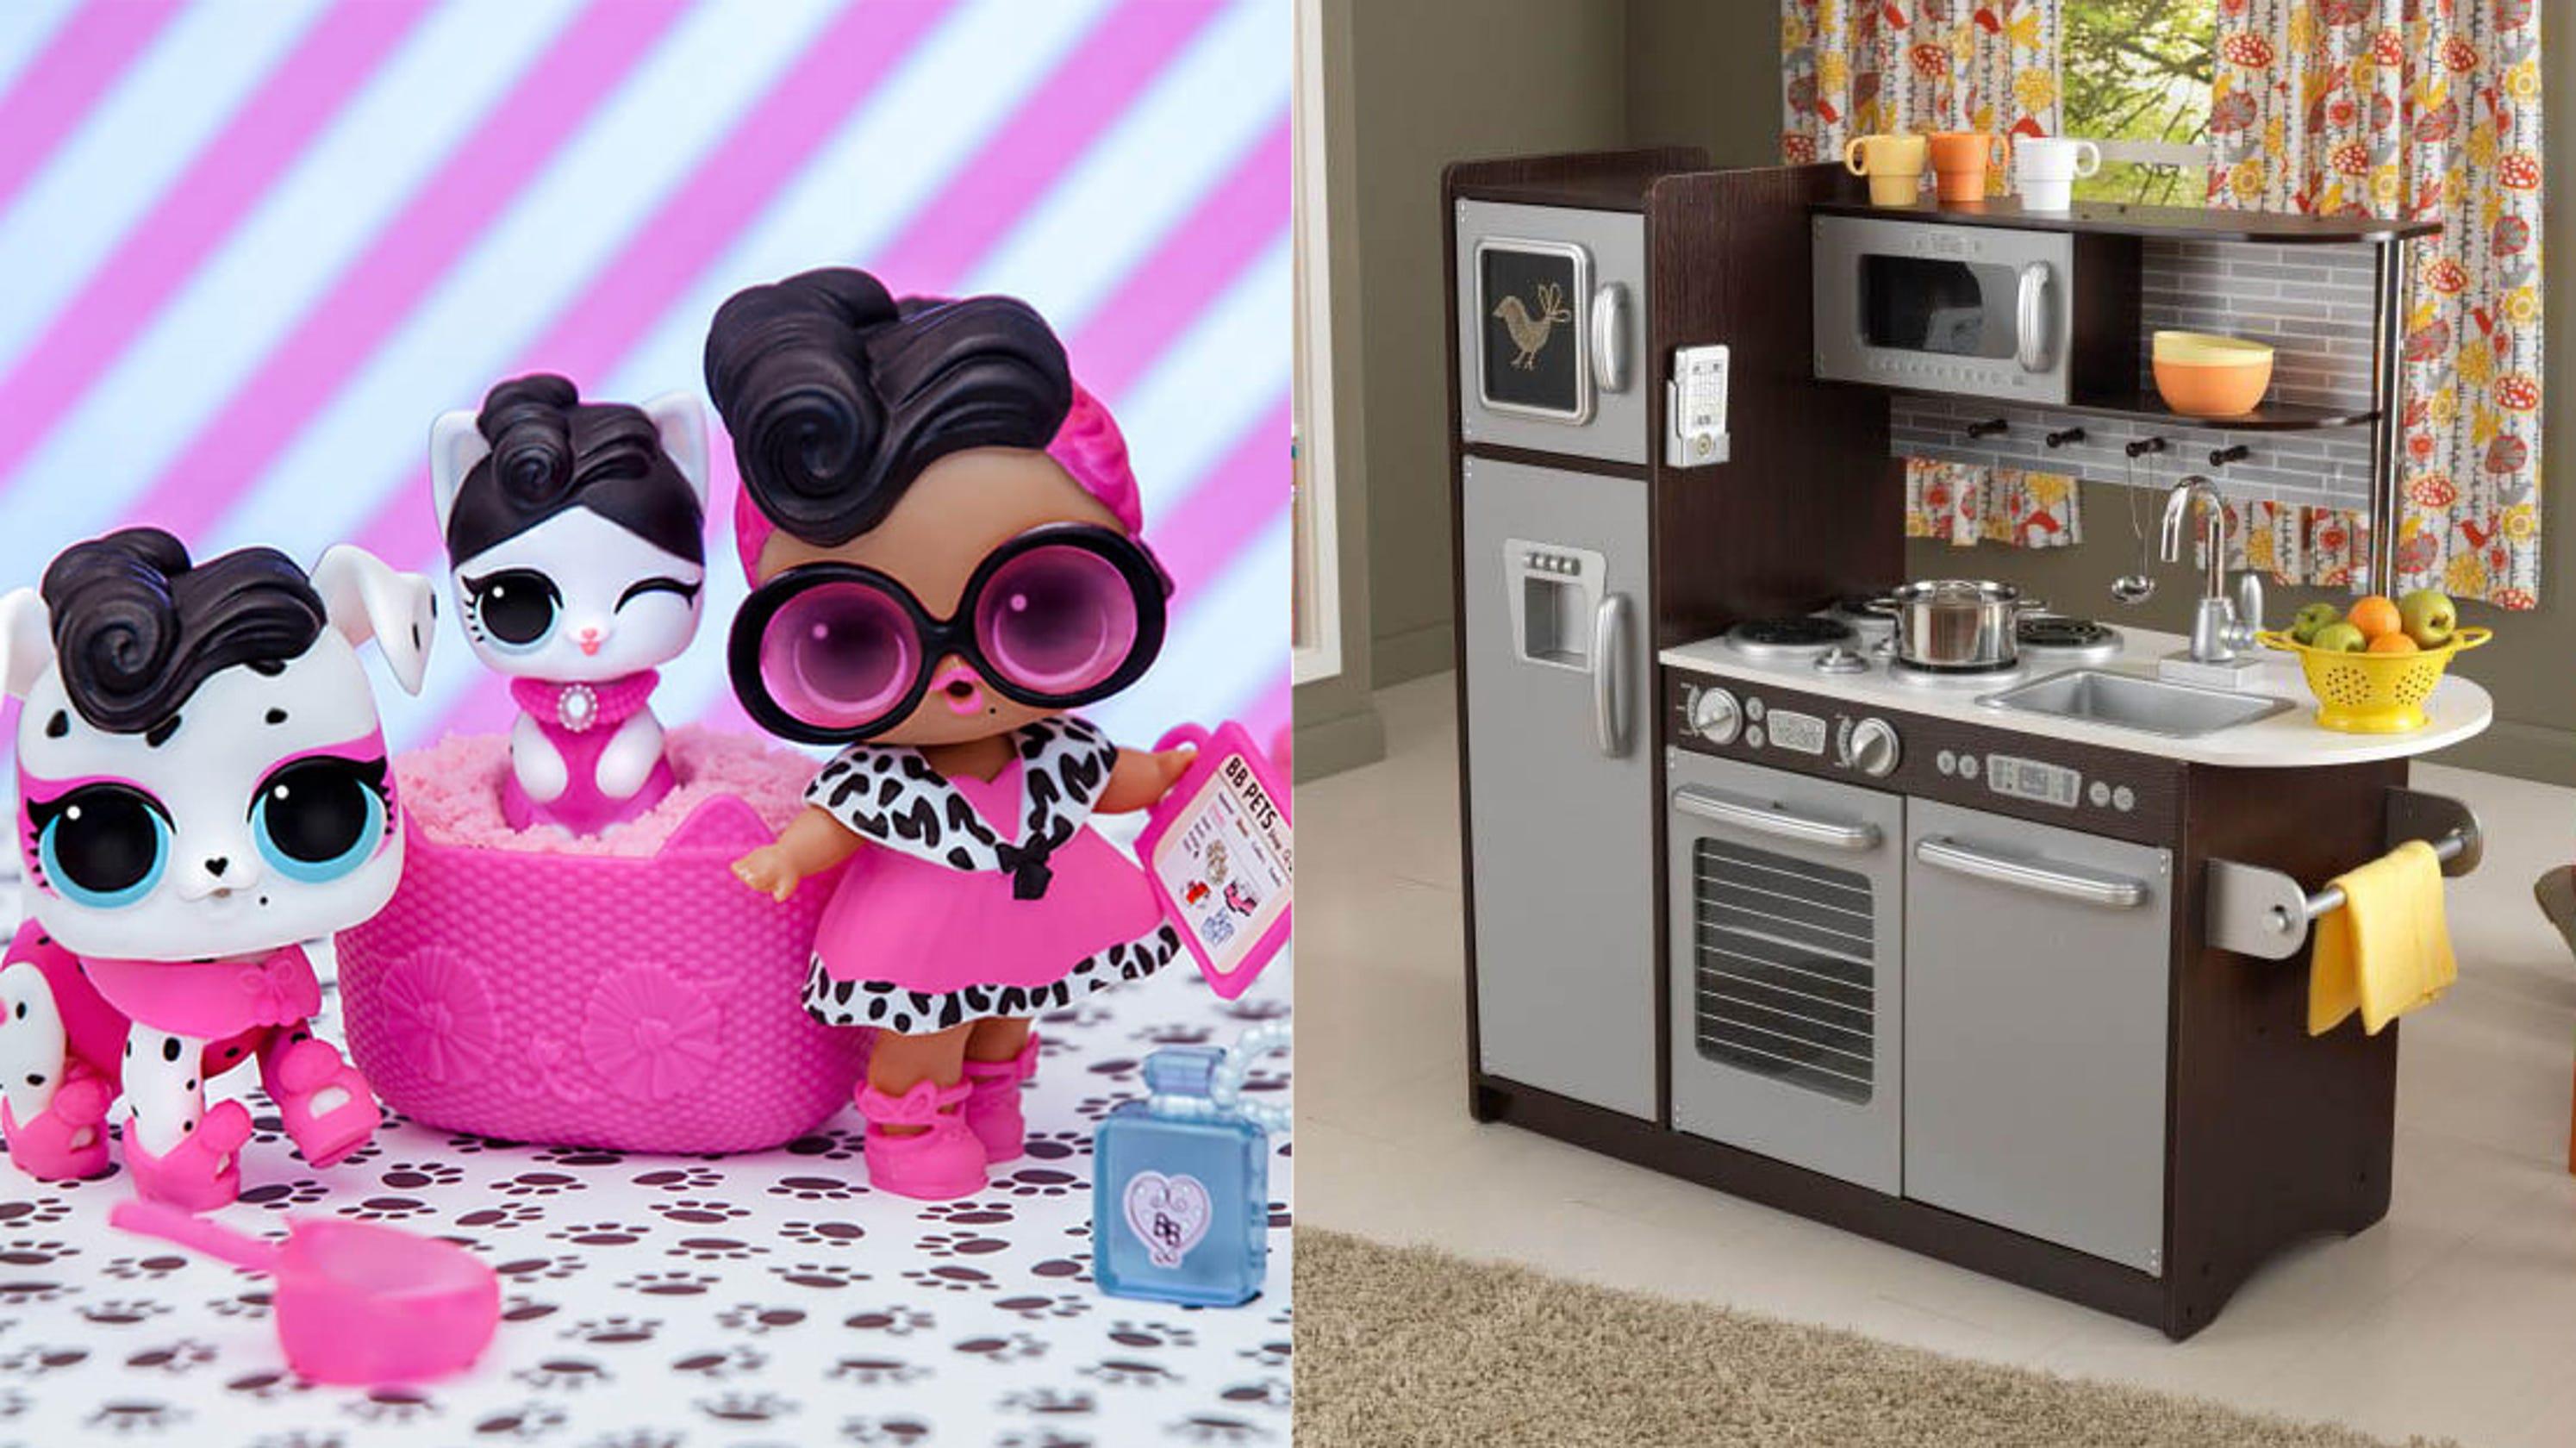 cyber monday 2018 deals on the most popular toys nintendo 3ds star wars droids l o l dolls. Black Bedroom Furniture Sets. Home Design Ideas